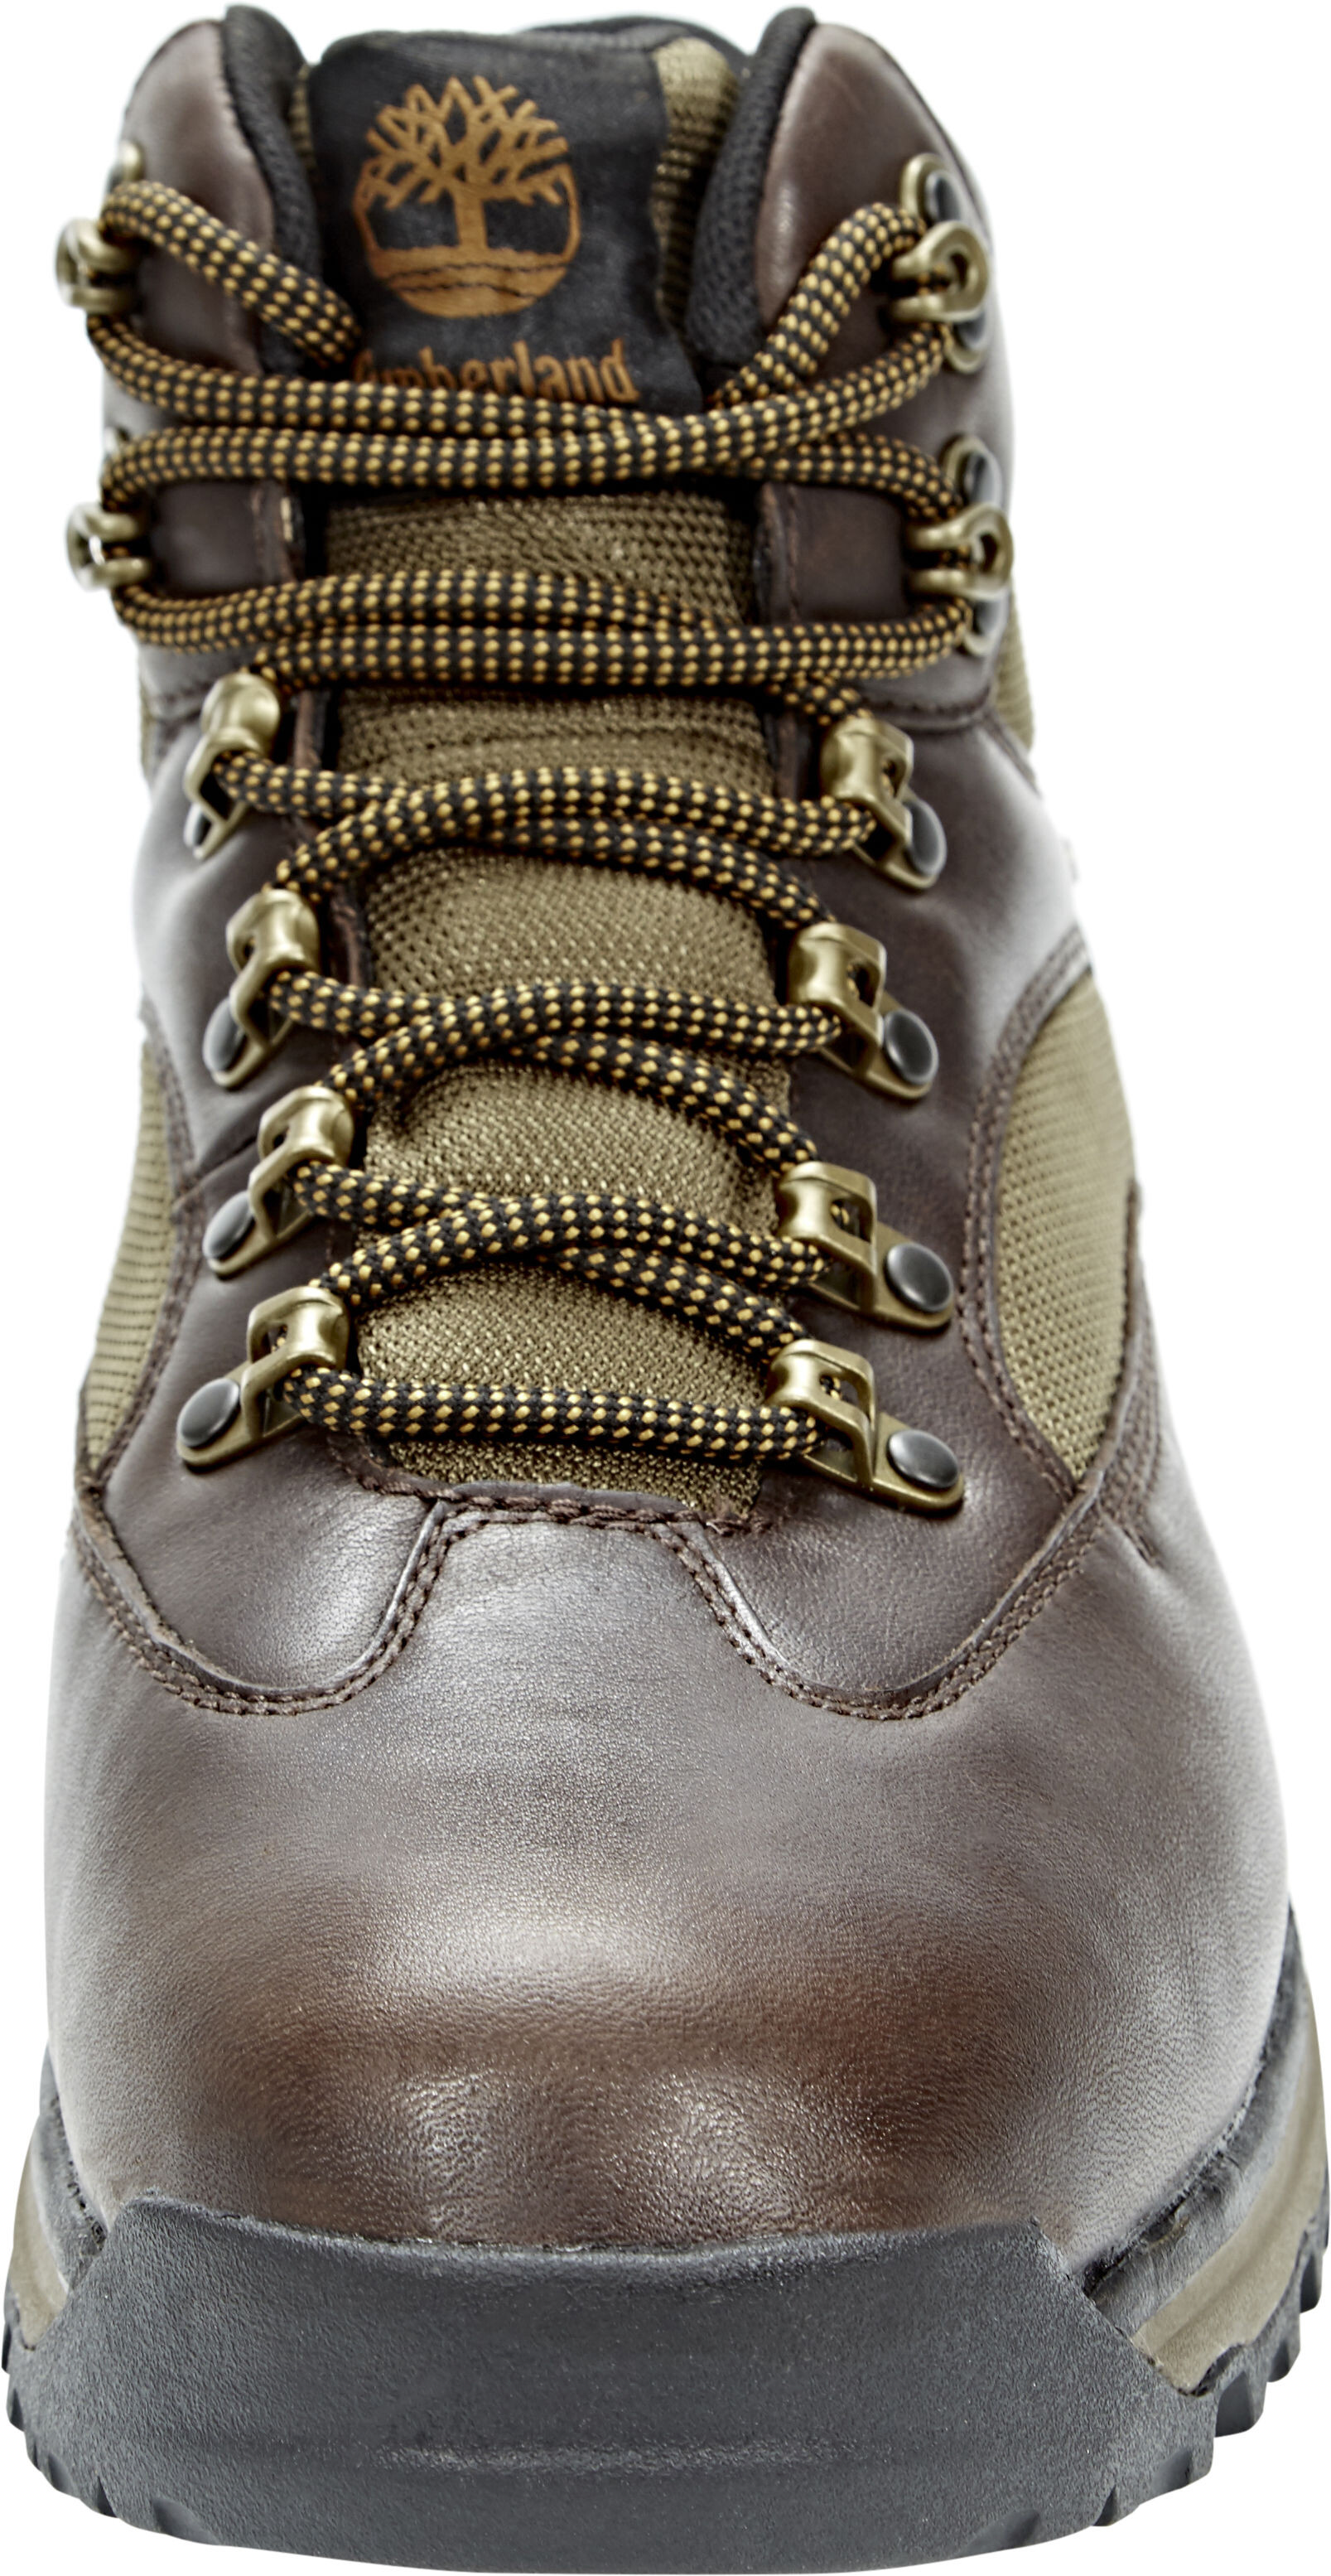 Timberland Chocorua Trail 2 GTX Miehet kengät  0e692086ba